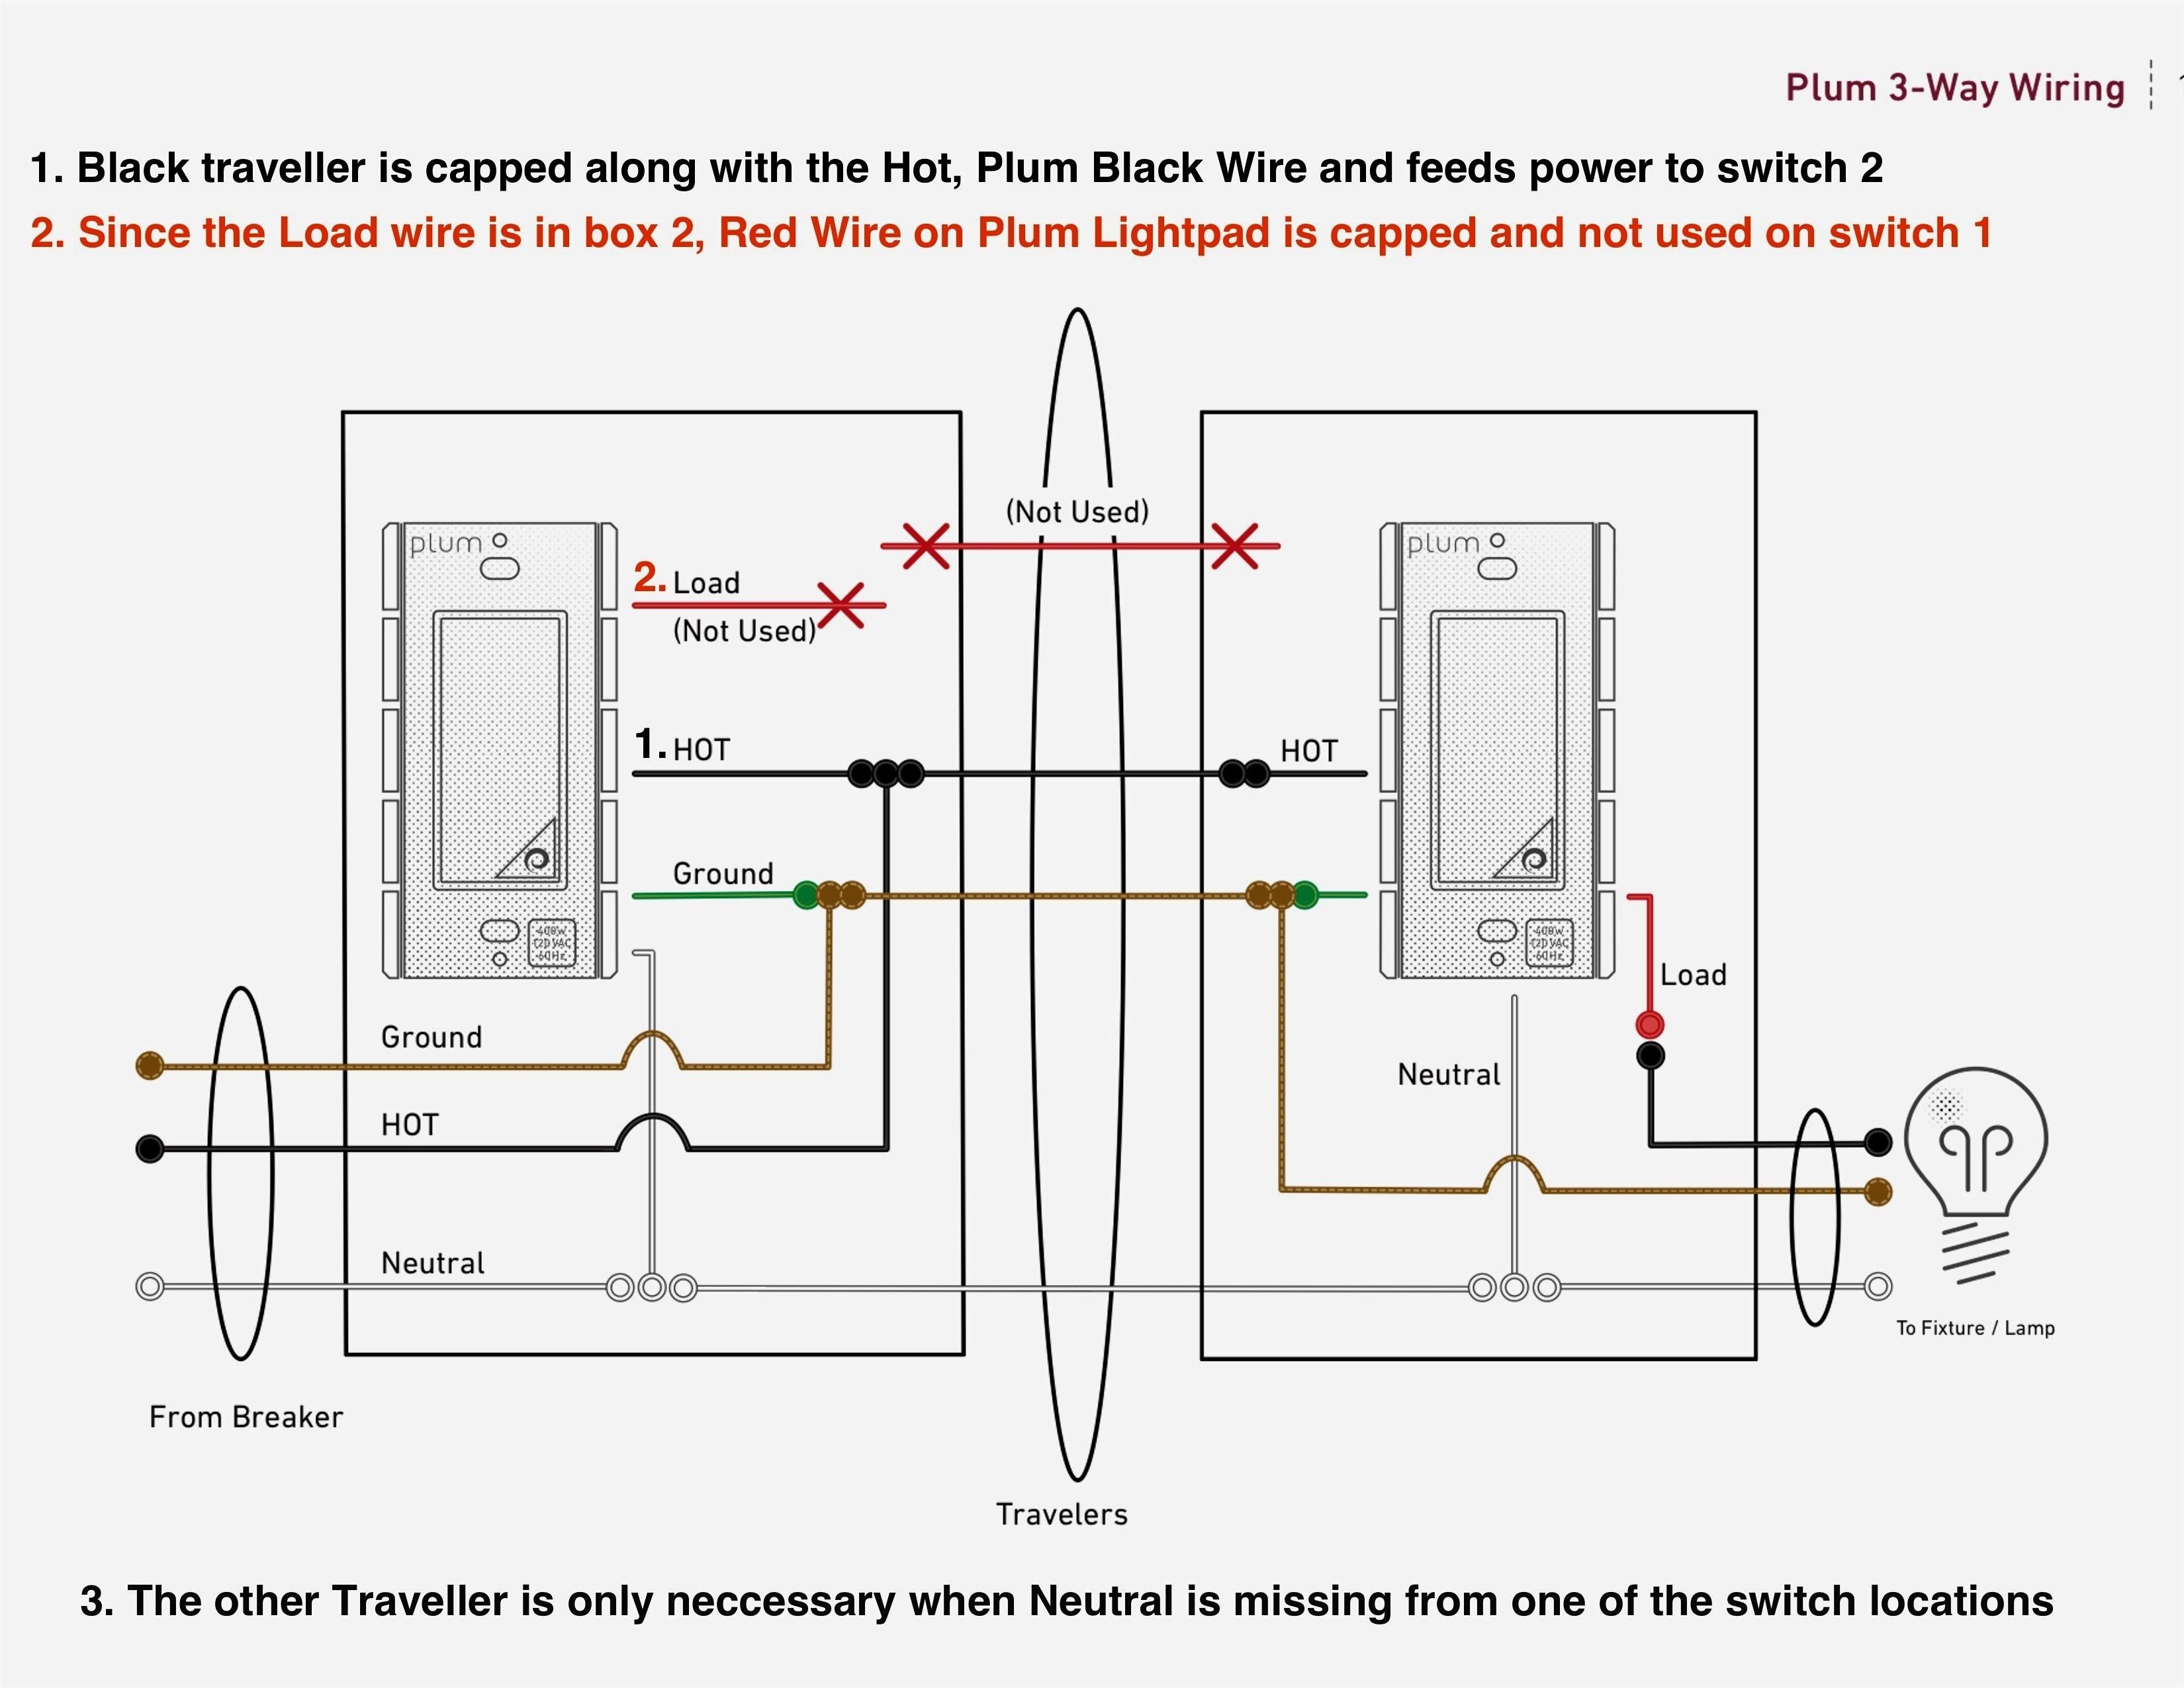 leviton t5625 wiring diagram Inspiration 3 Way Dimmer Switch Wiring Diagram Irelandnews Co